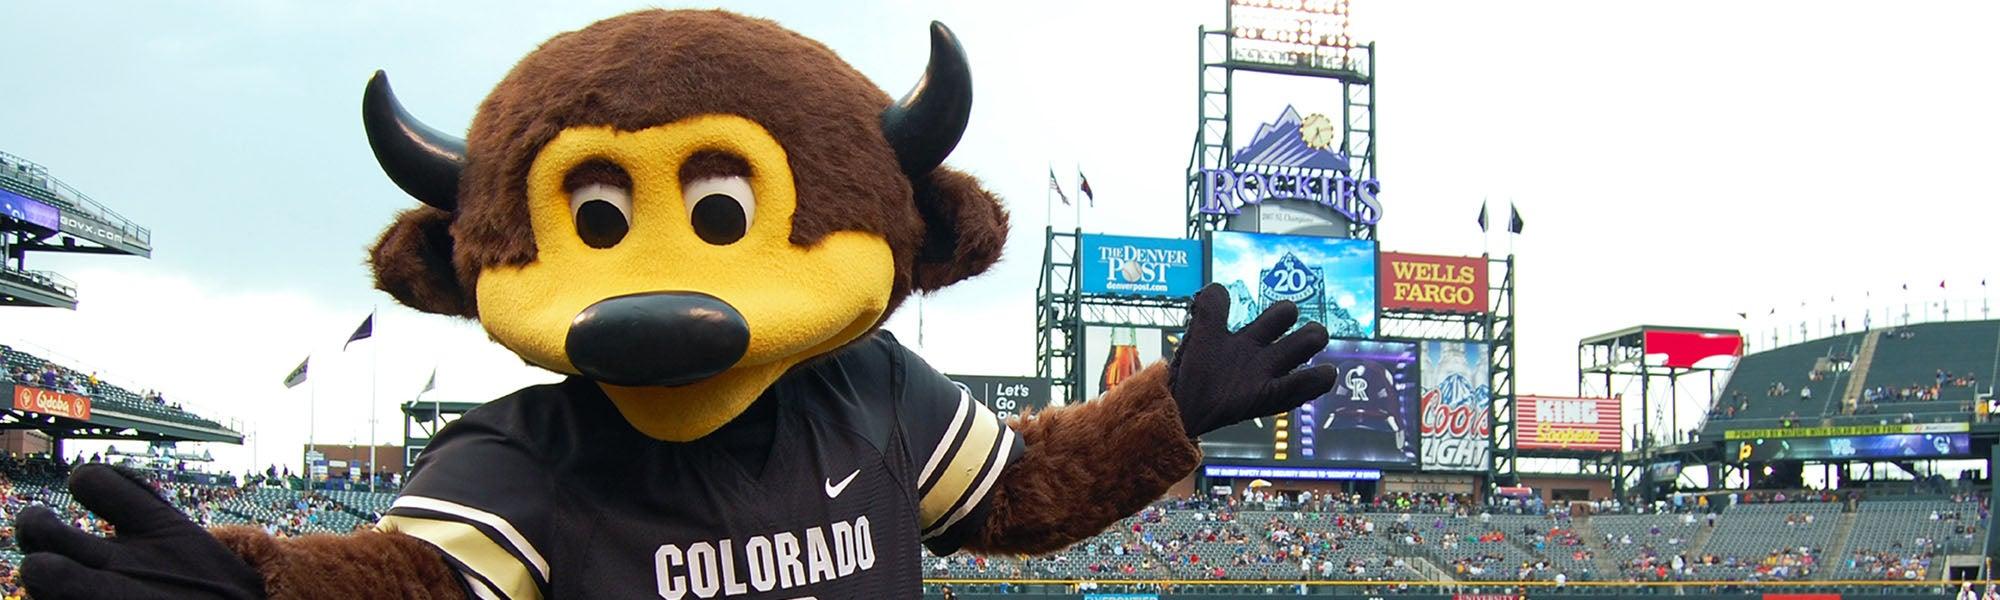 Chip CU Boulder Mascot at CU Boulder night at the Rockies